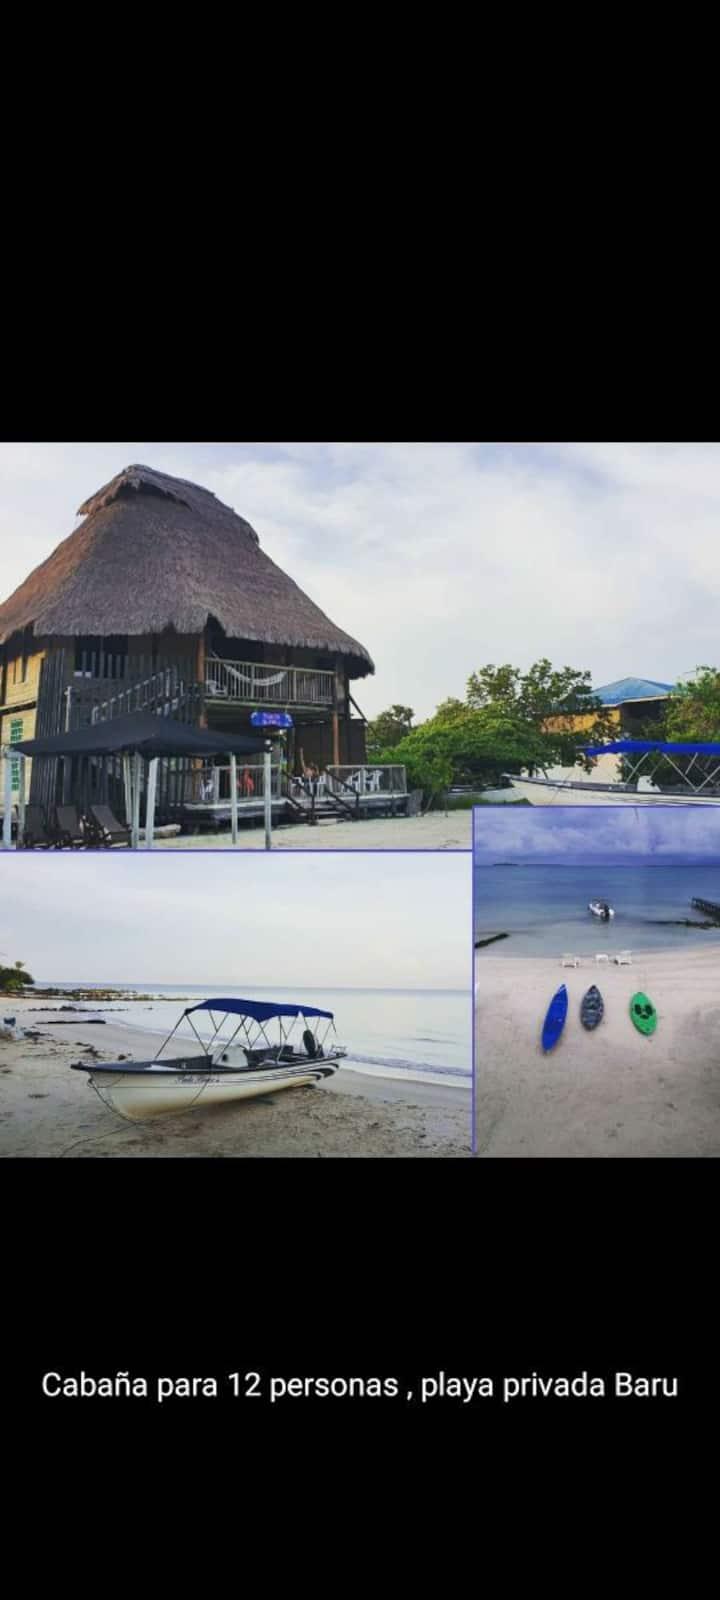 Cabaña en Isla privadaa 10 minutos de Baru